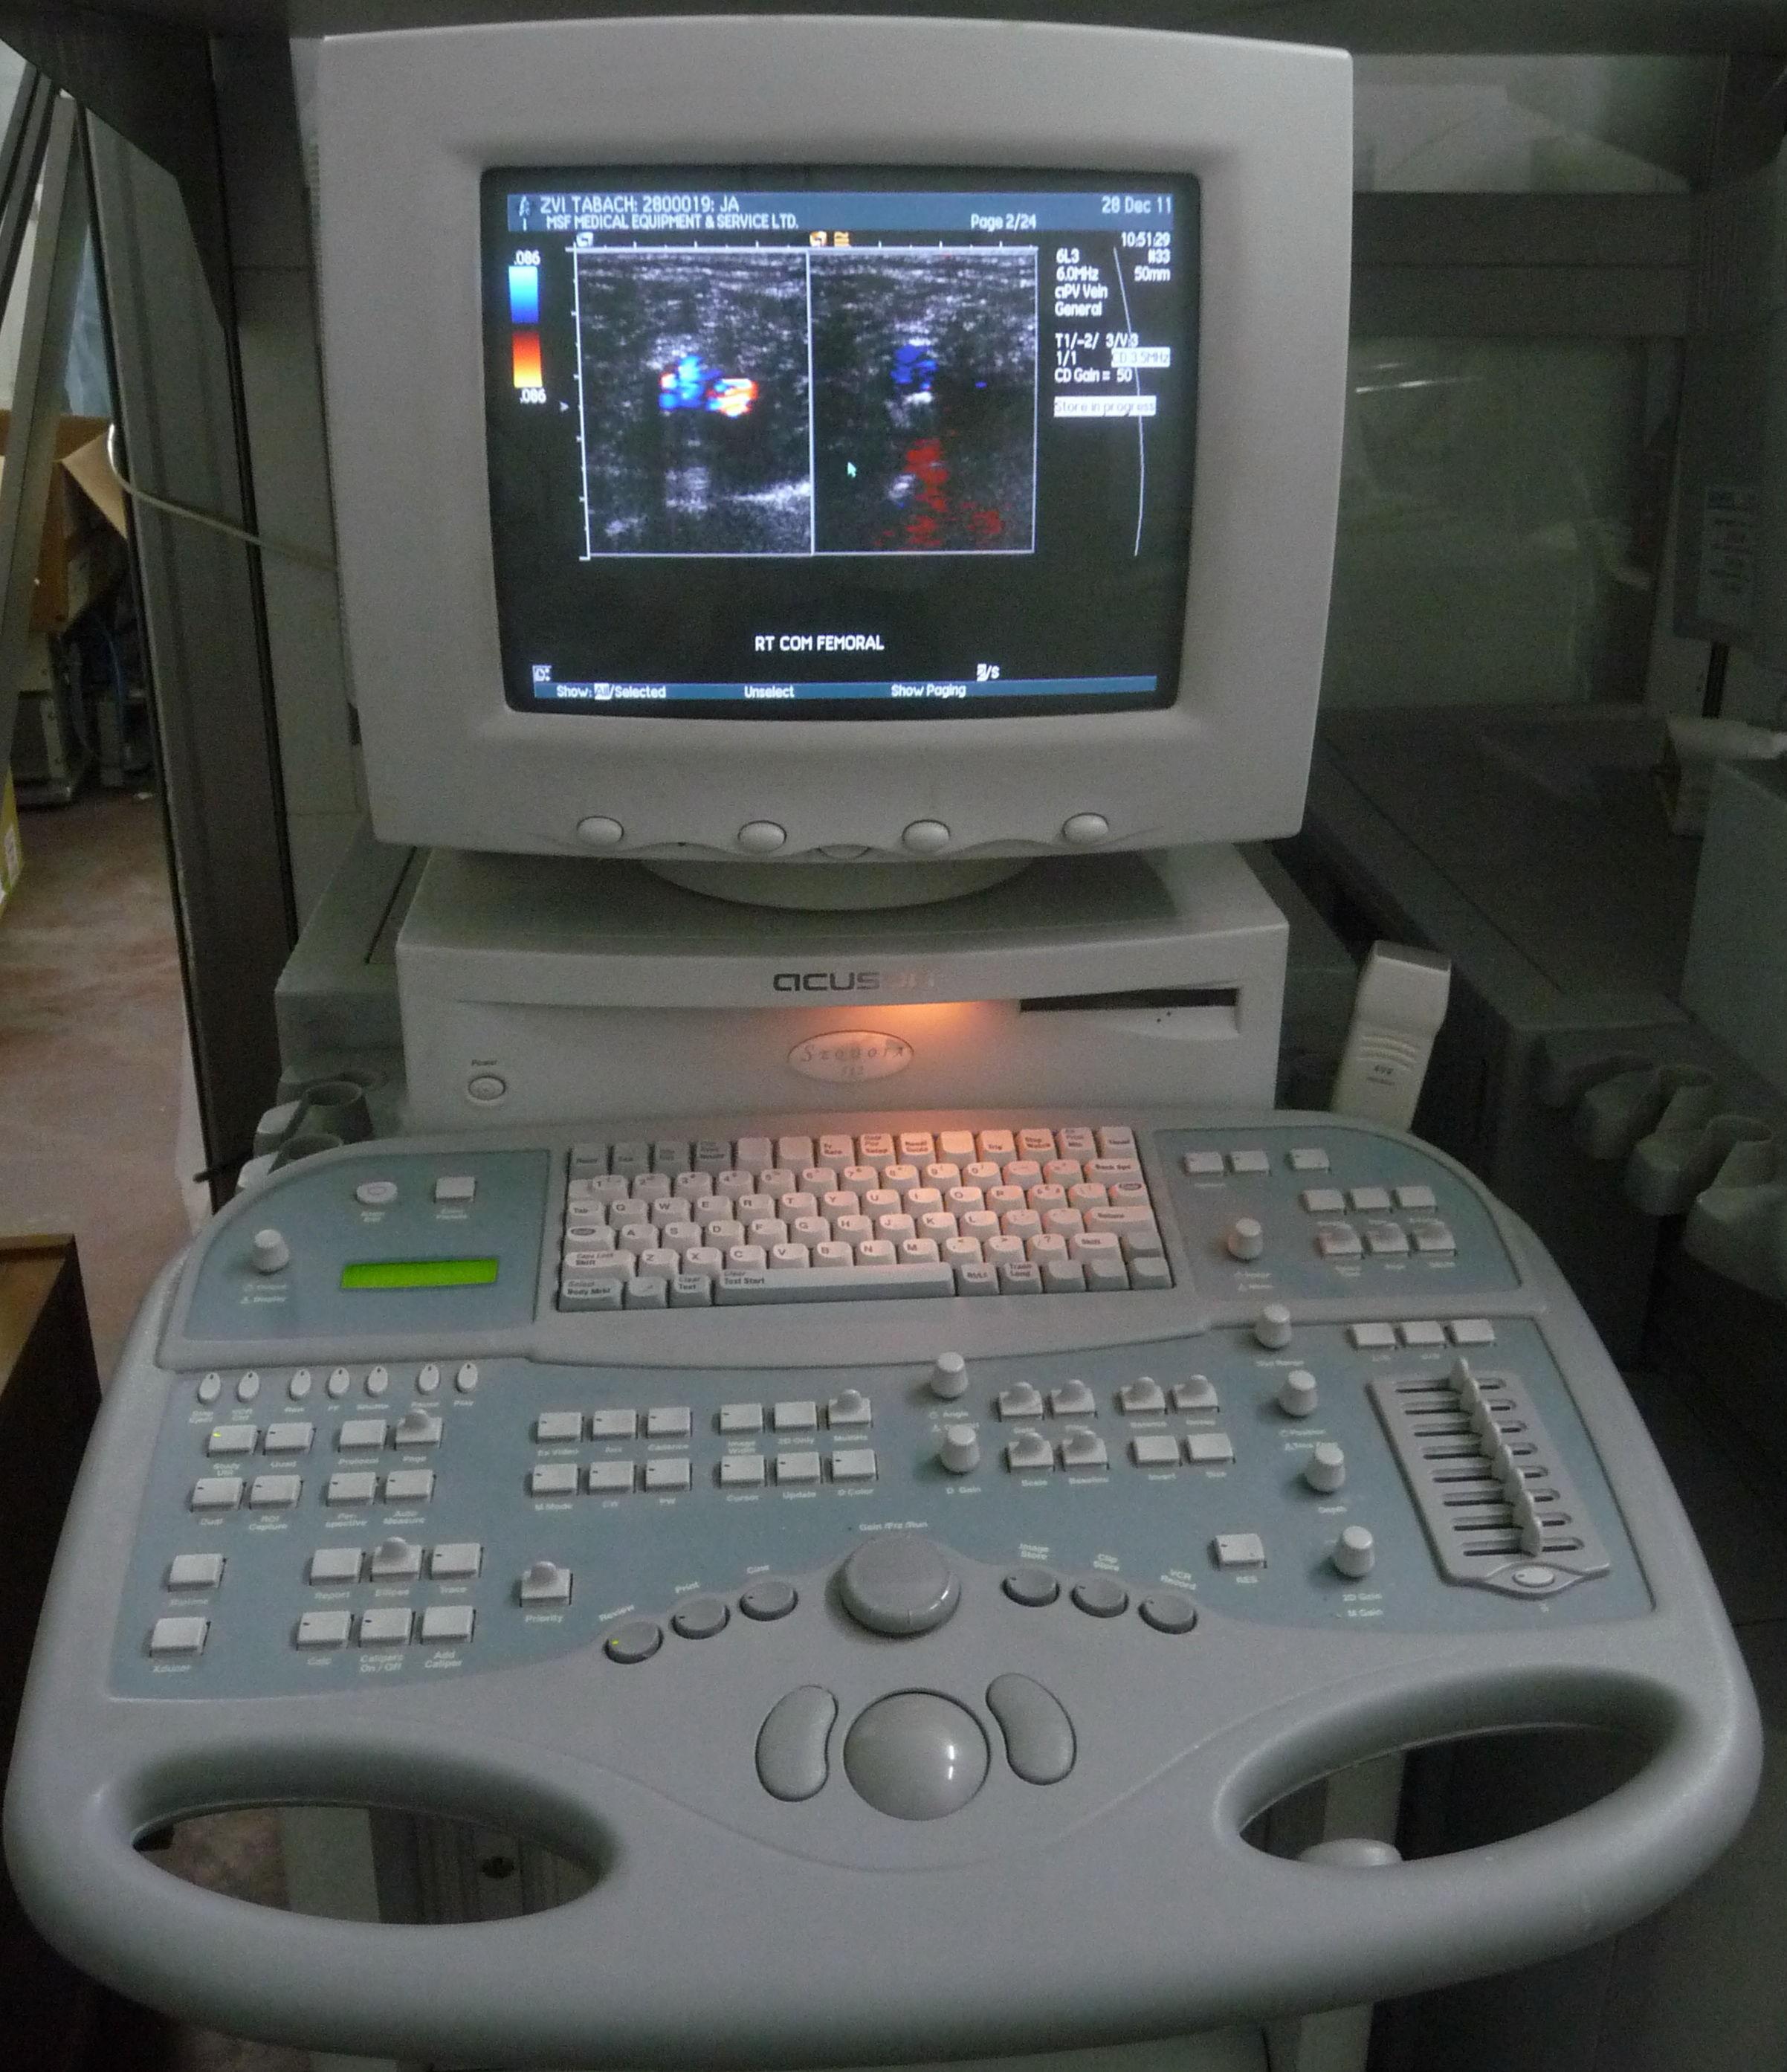 siemens acuson sequoia c512 cardiac ultrasound model information rh dotmed com Acuson Ultrasound Machine Acuson Ultrasound Machine